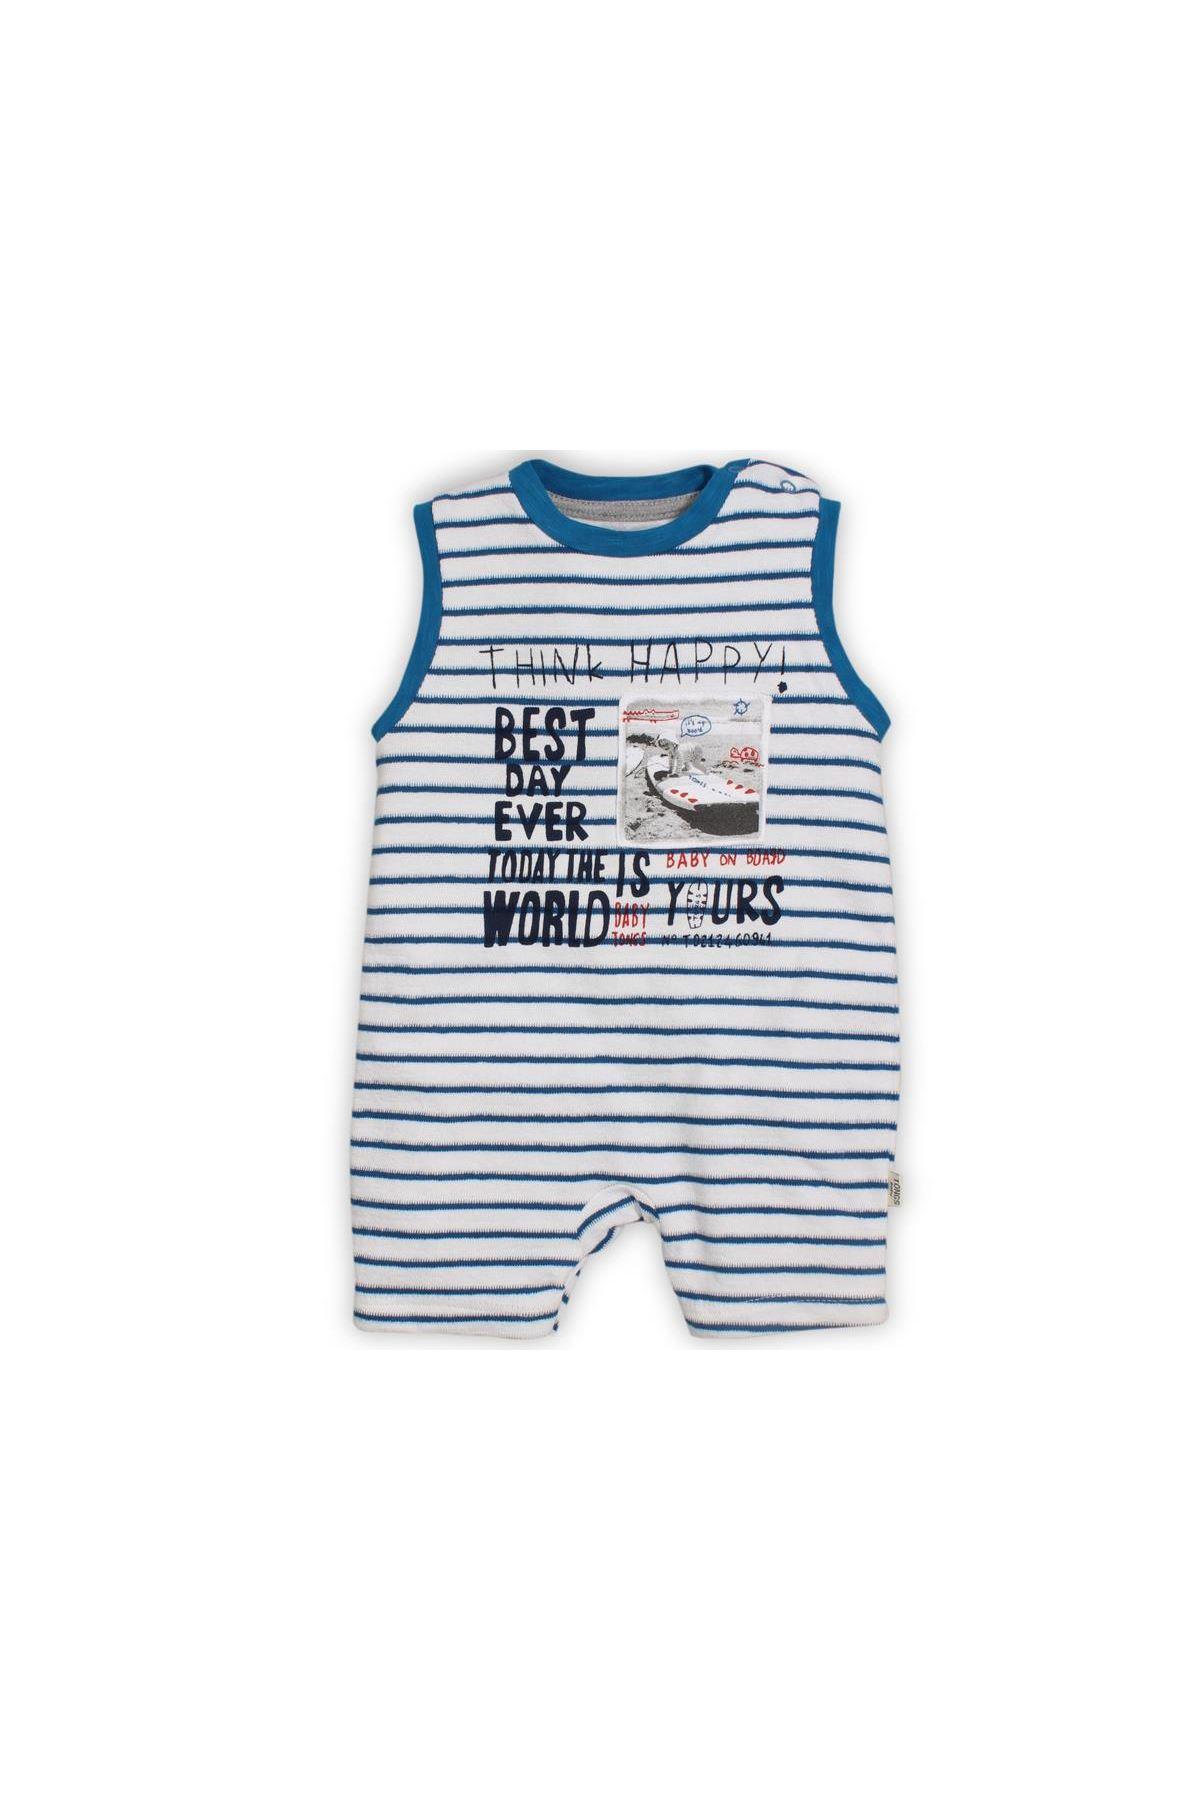 Tongs Baby On Board Kısa Tulum 2582 Mavi